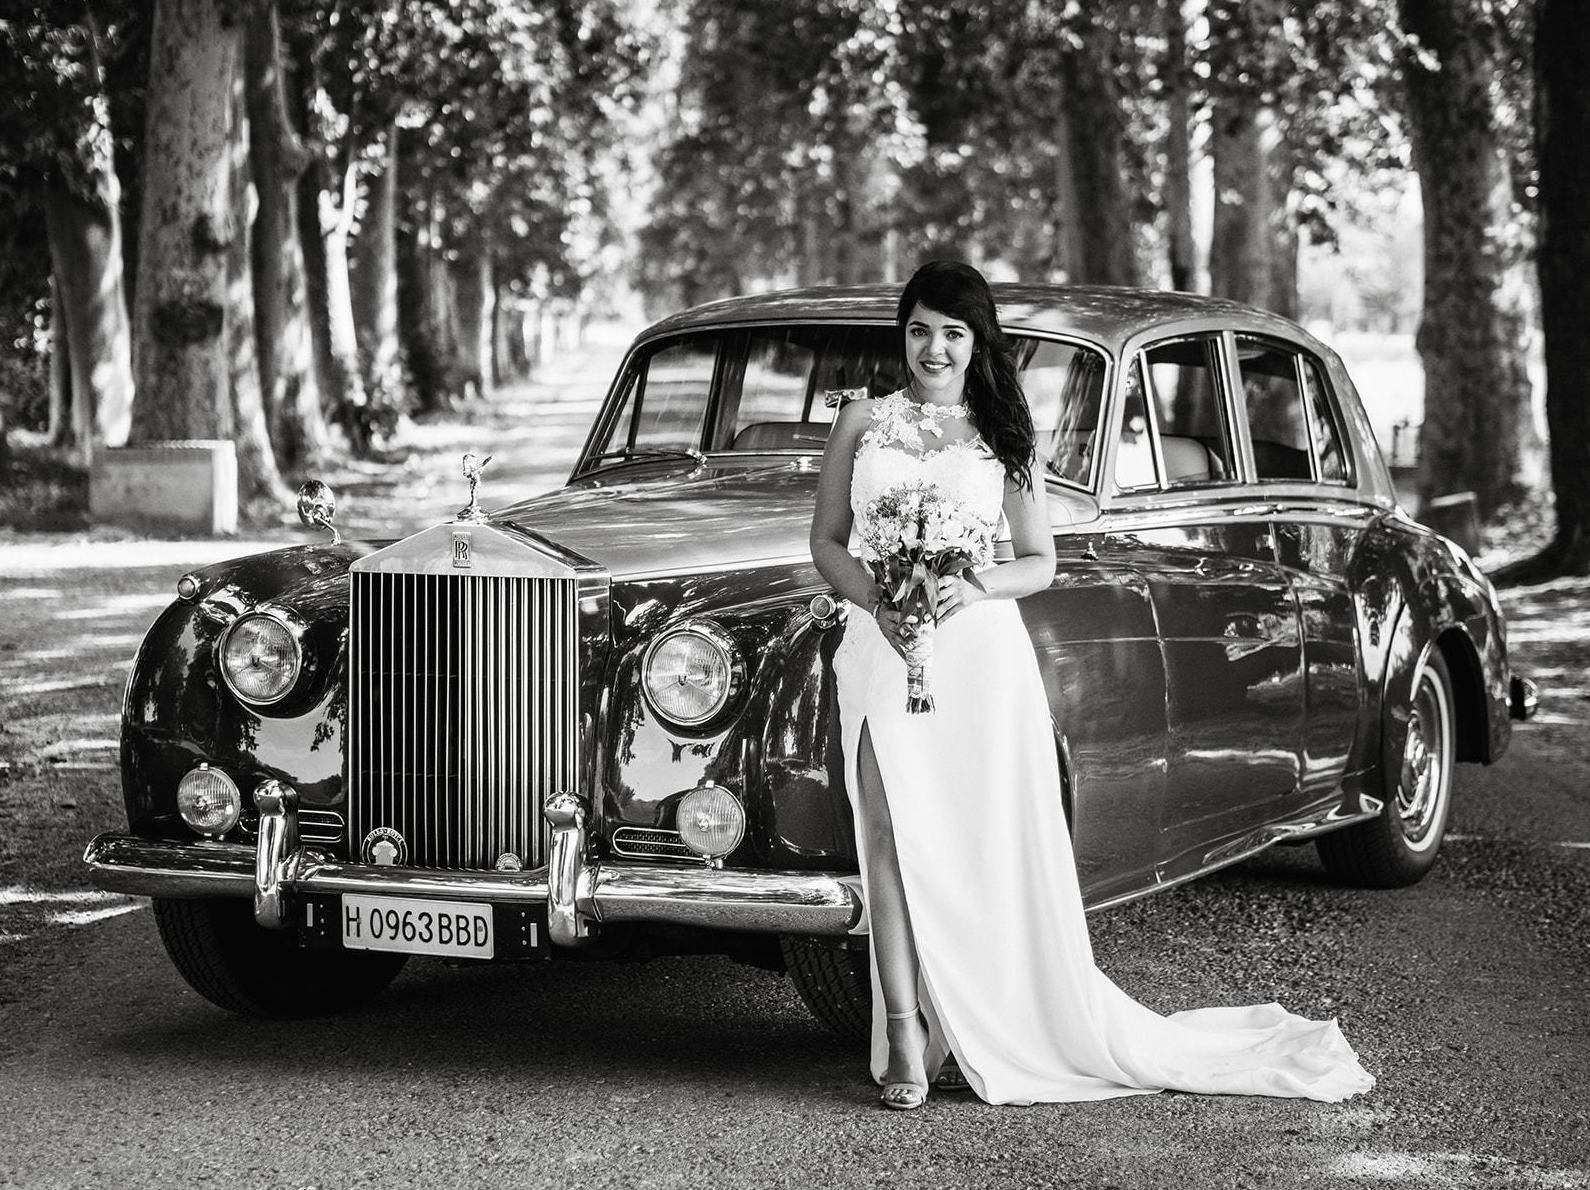 Roolls Royce Silver Cloud II 1960: Vehículos de Iberocab